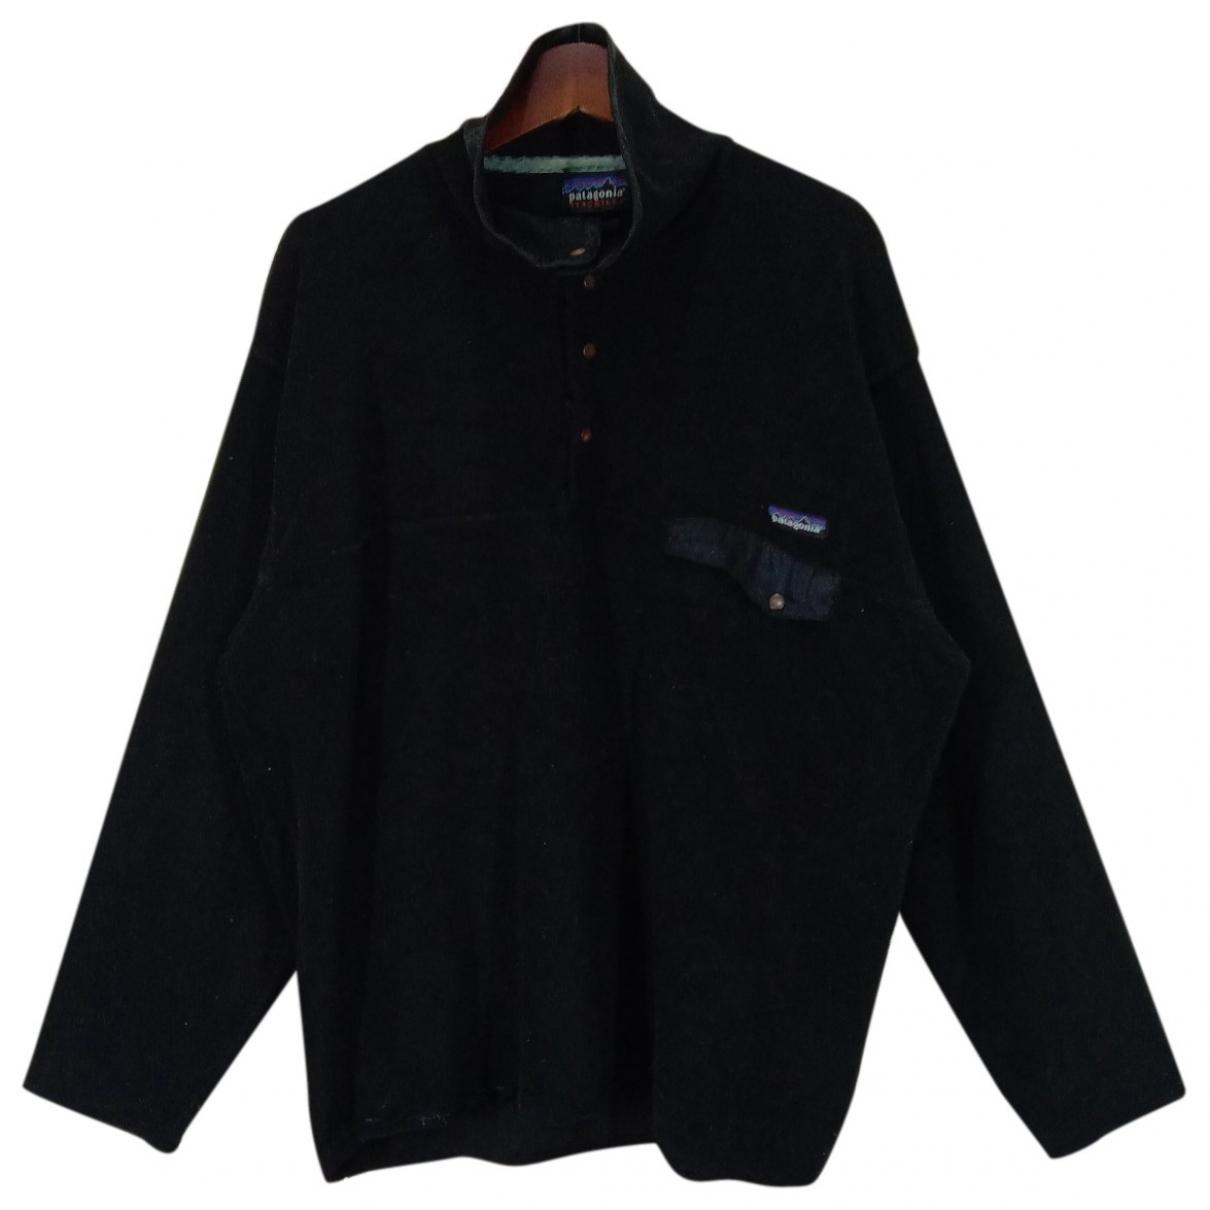 Patagonia \N Black jacket  for Men L International